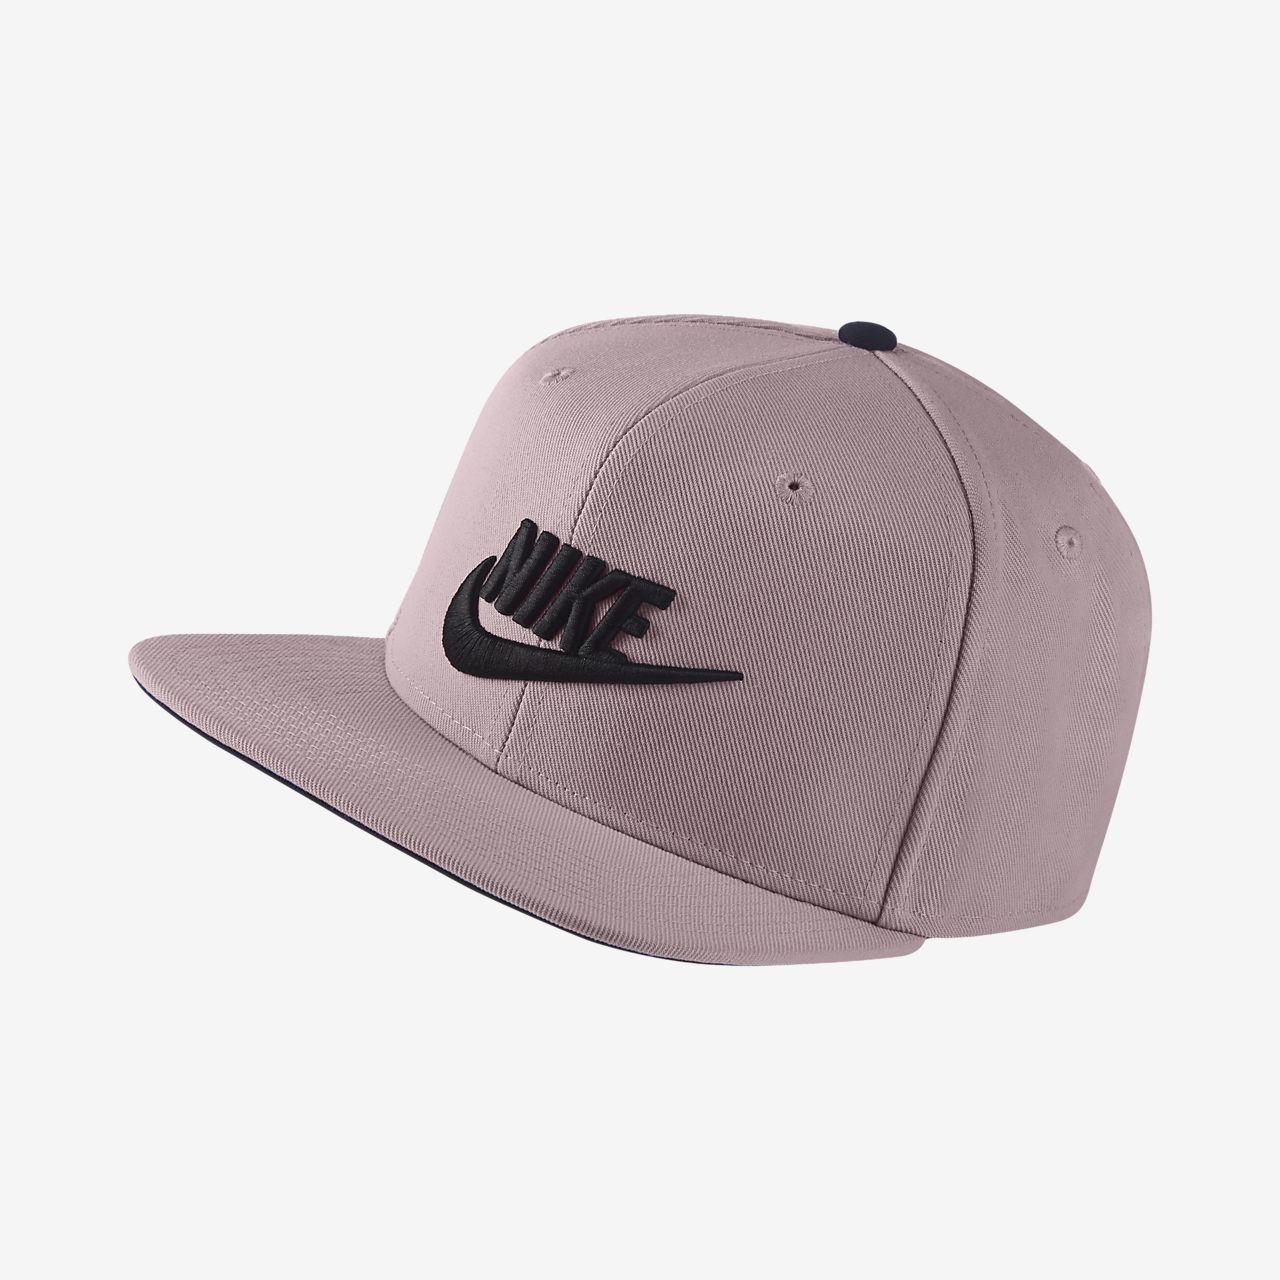 cafe9fdab79ee Nike Sportswear Pro Adjustable Hat. Nike.com NO